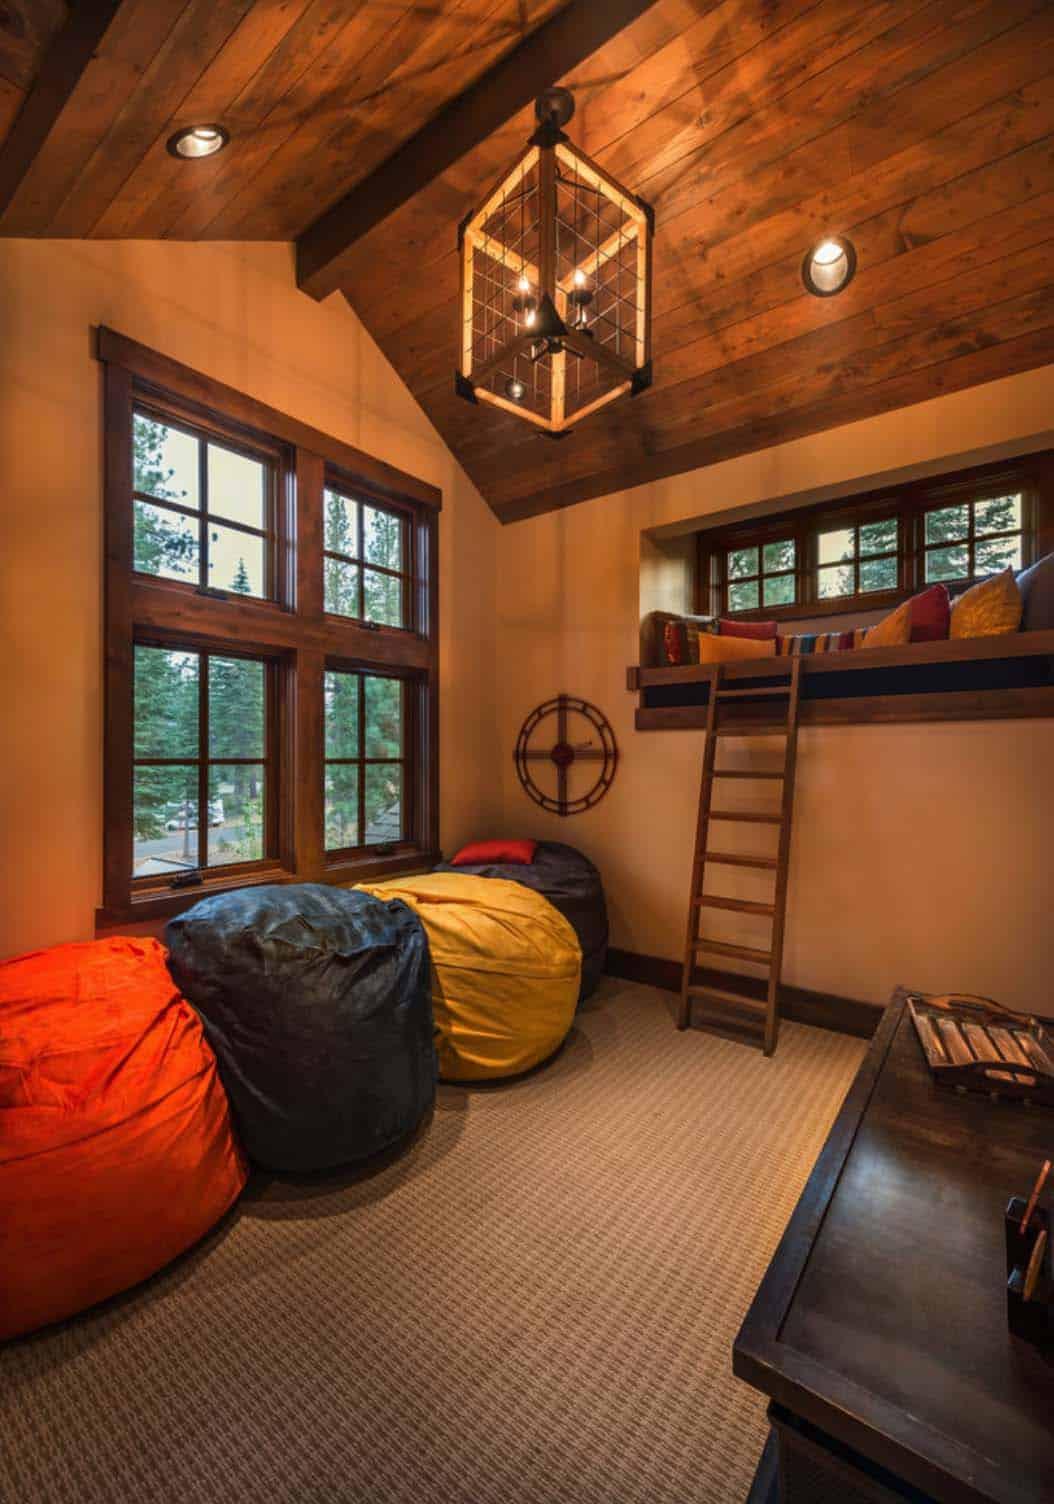 Contemporary Mountain Home-Dennis Zirbel-19-1 Kindesign